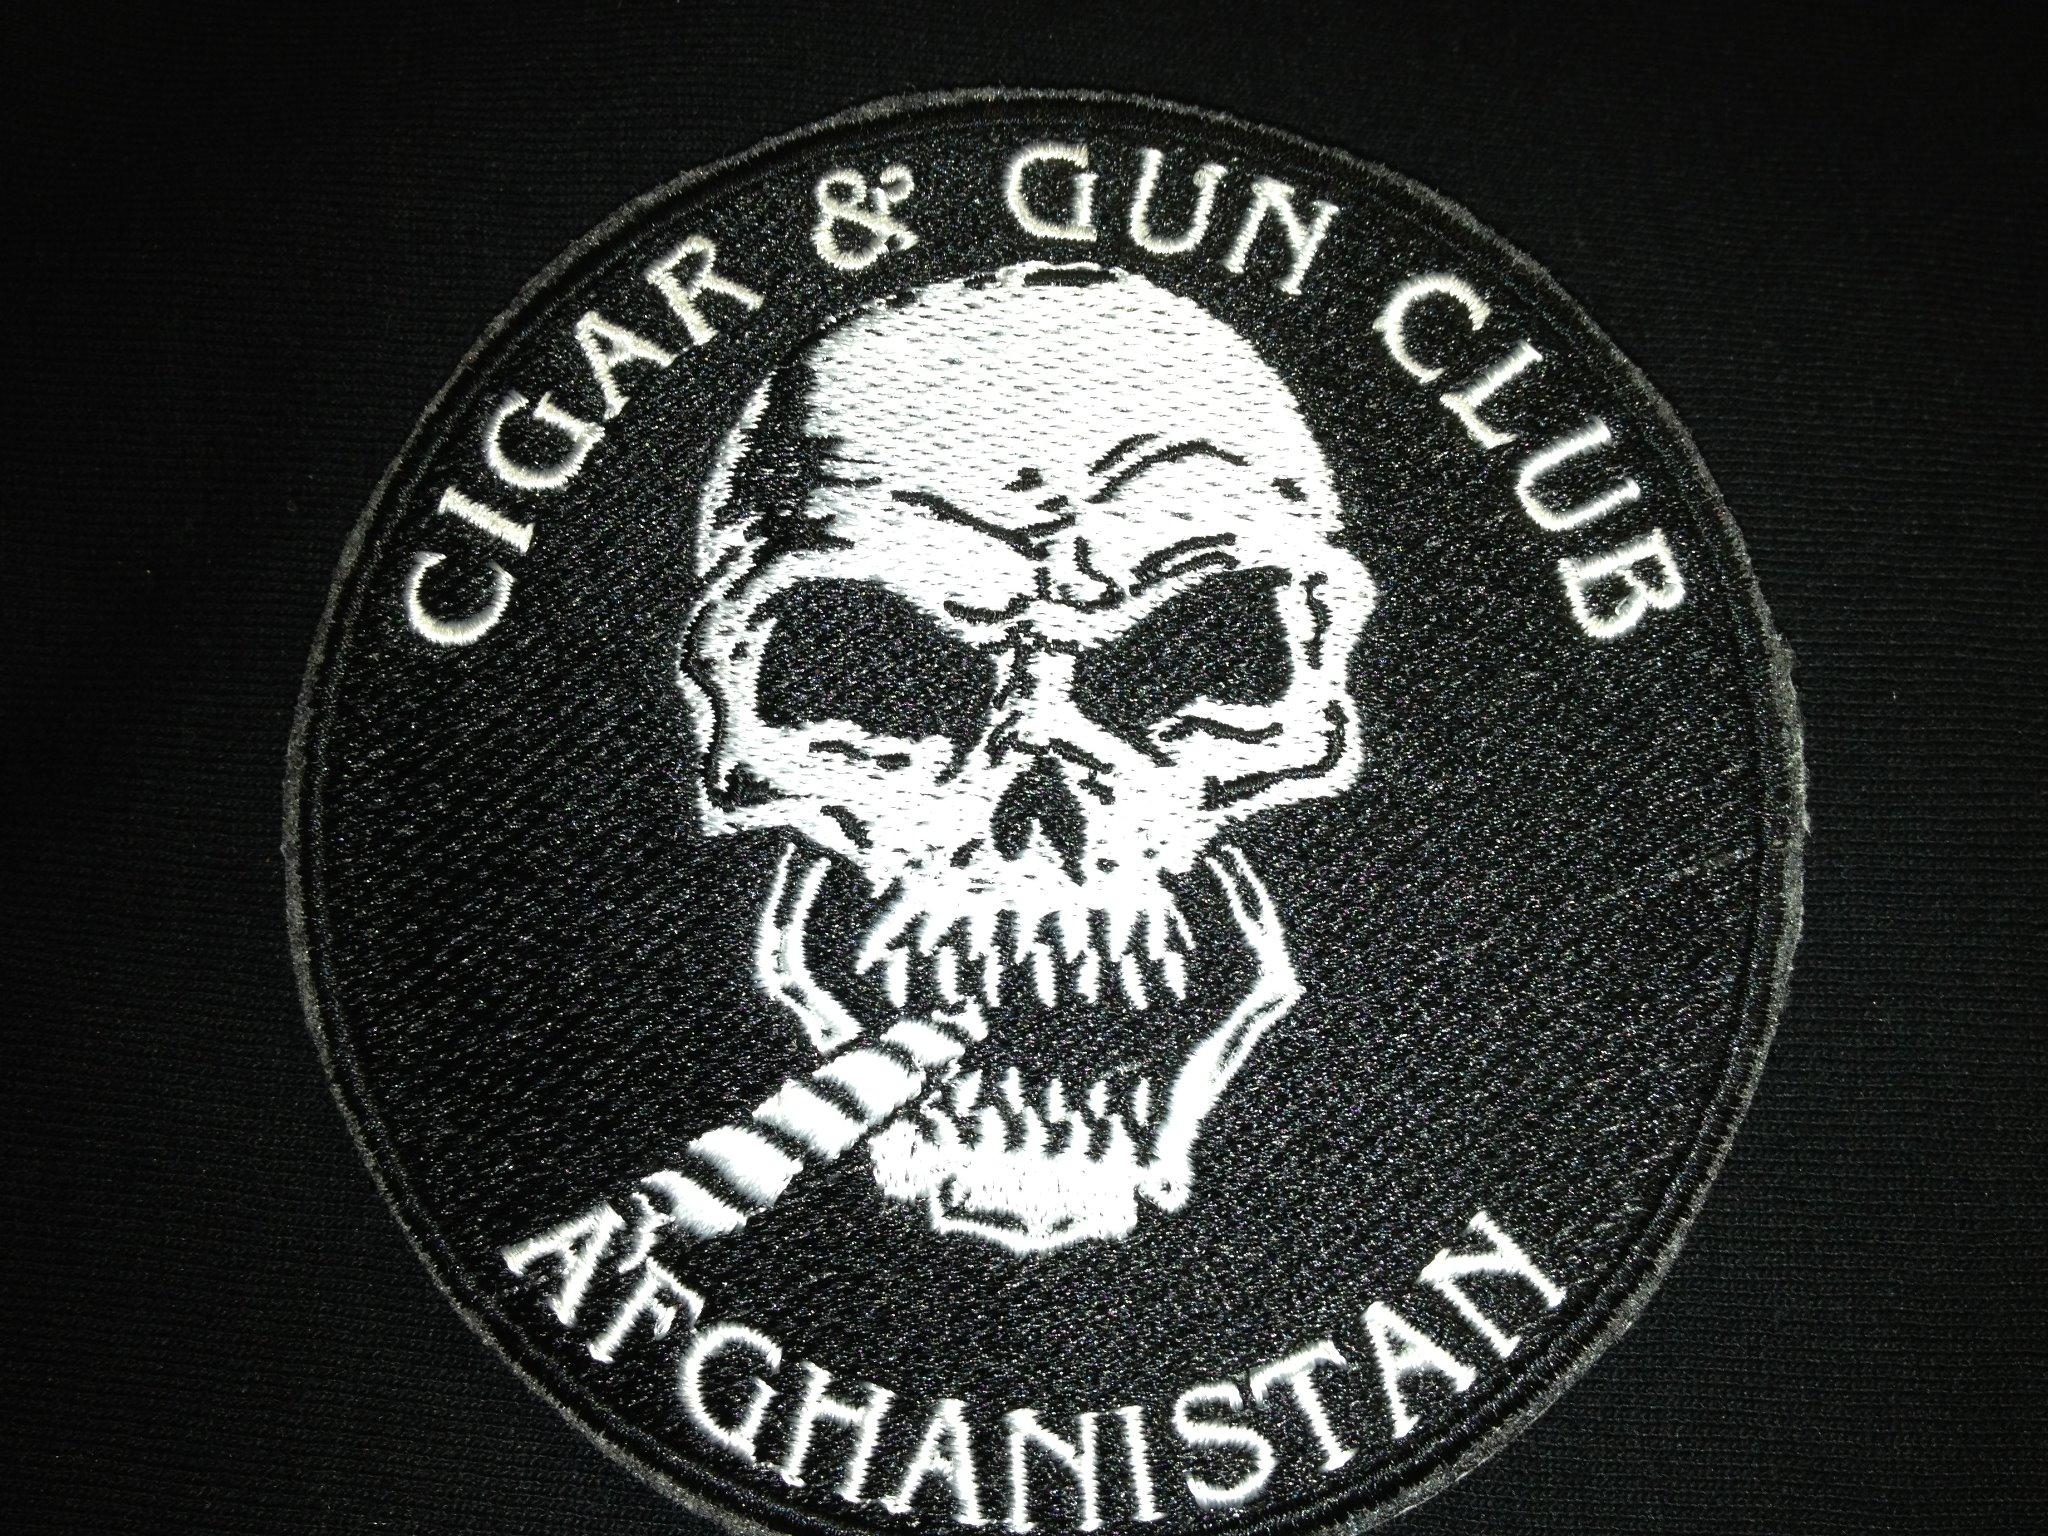 cigar-and-gun-club_szivarklub_szivarbaratsag_szivarblog.jpg